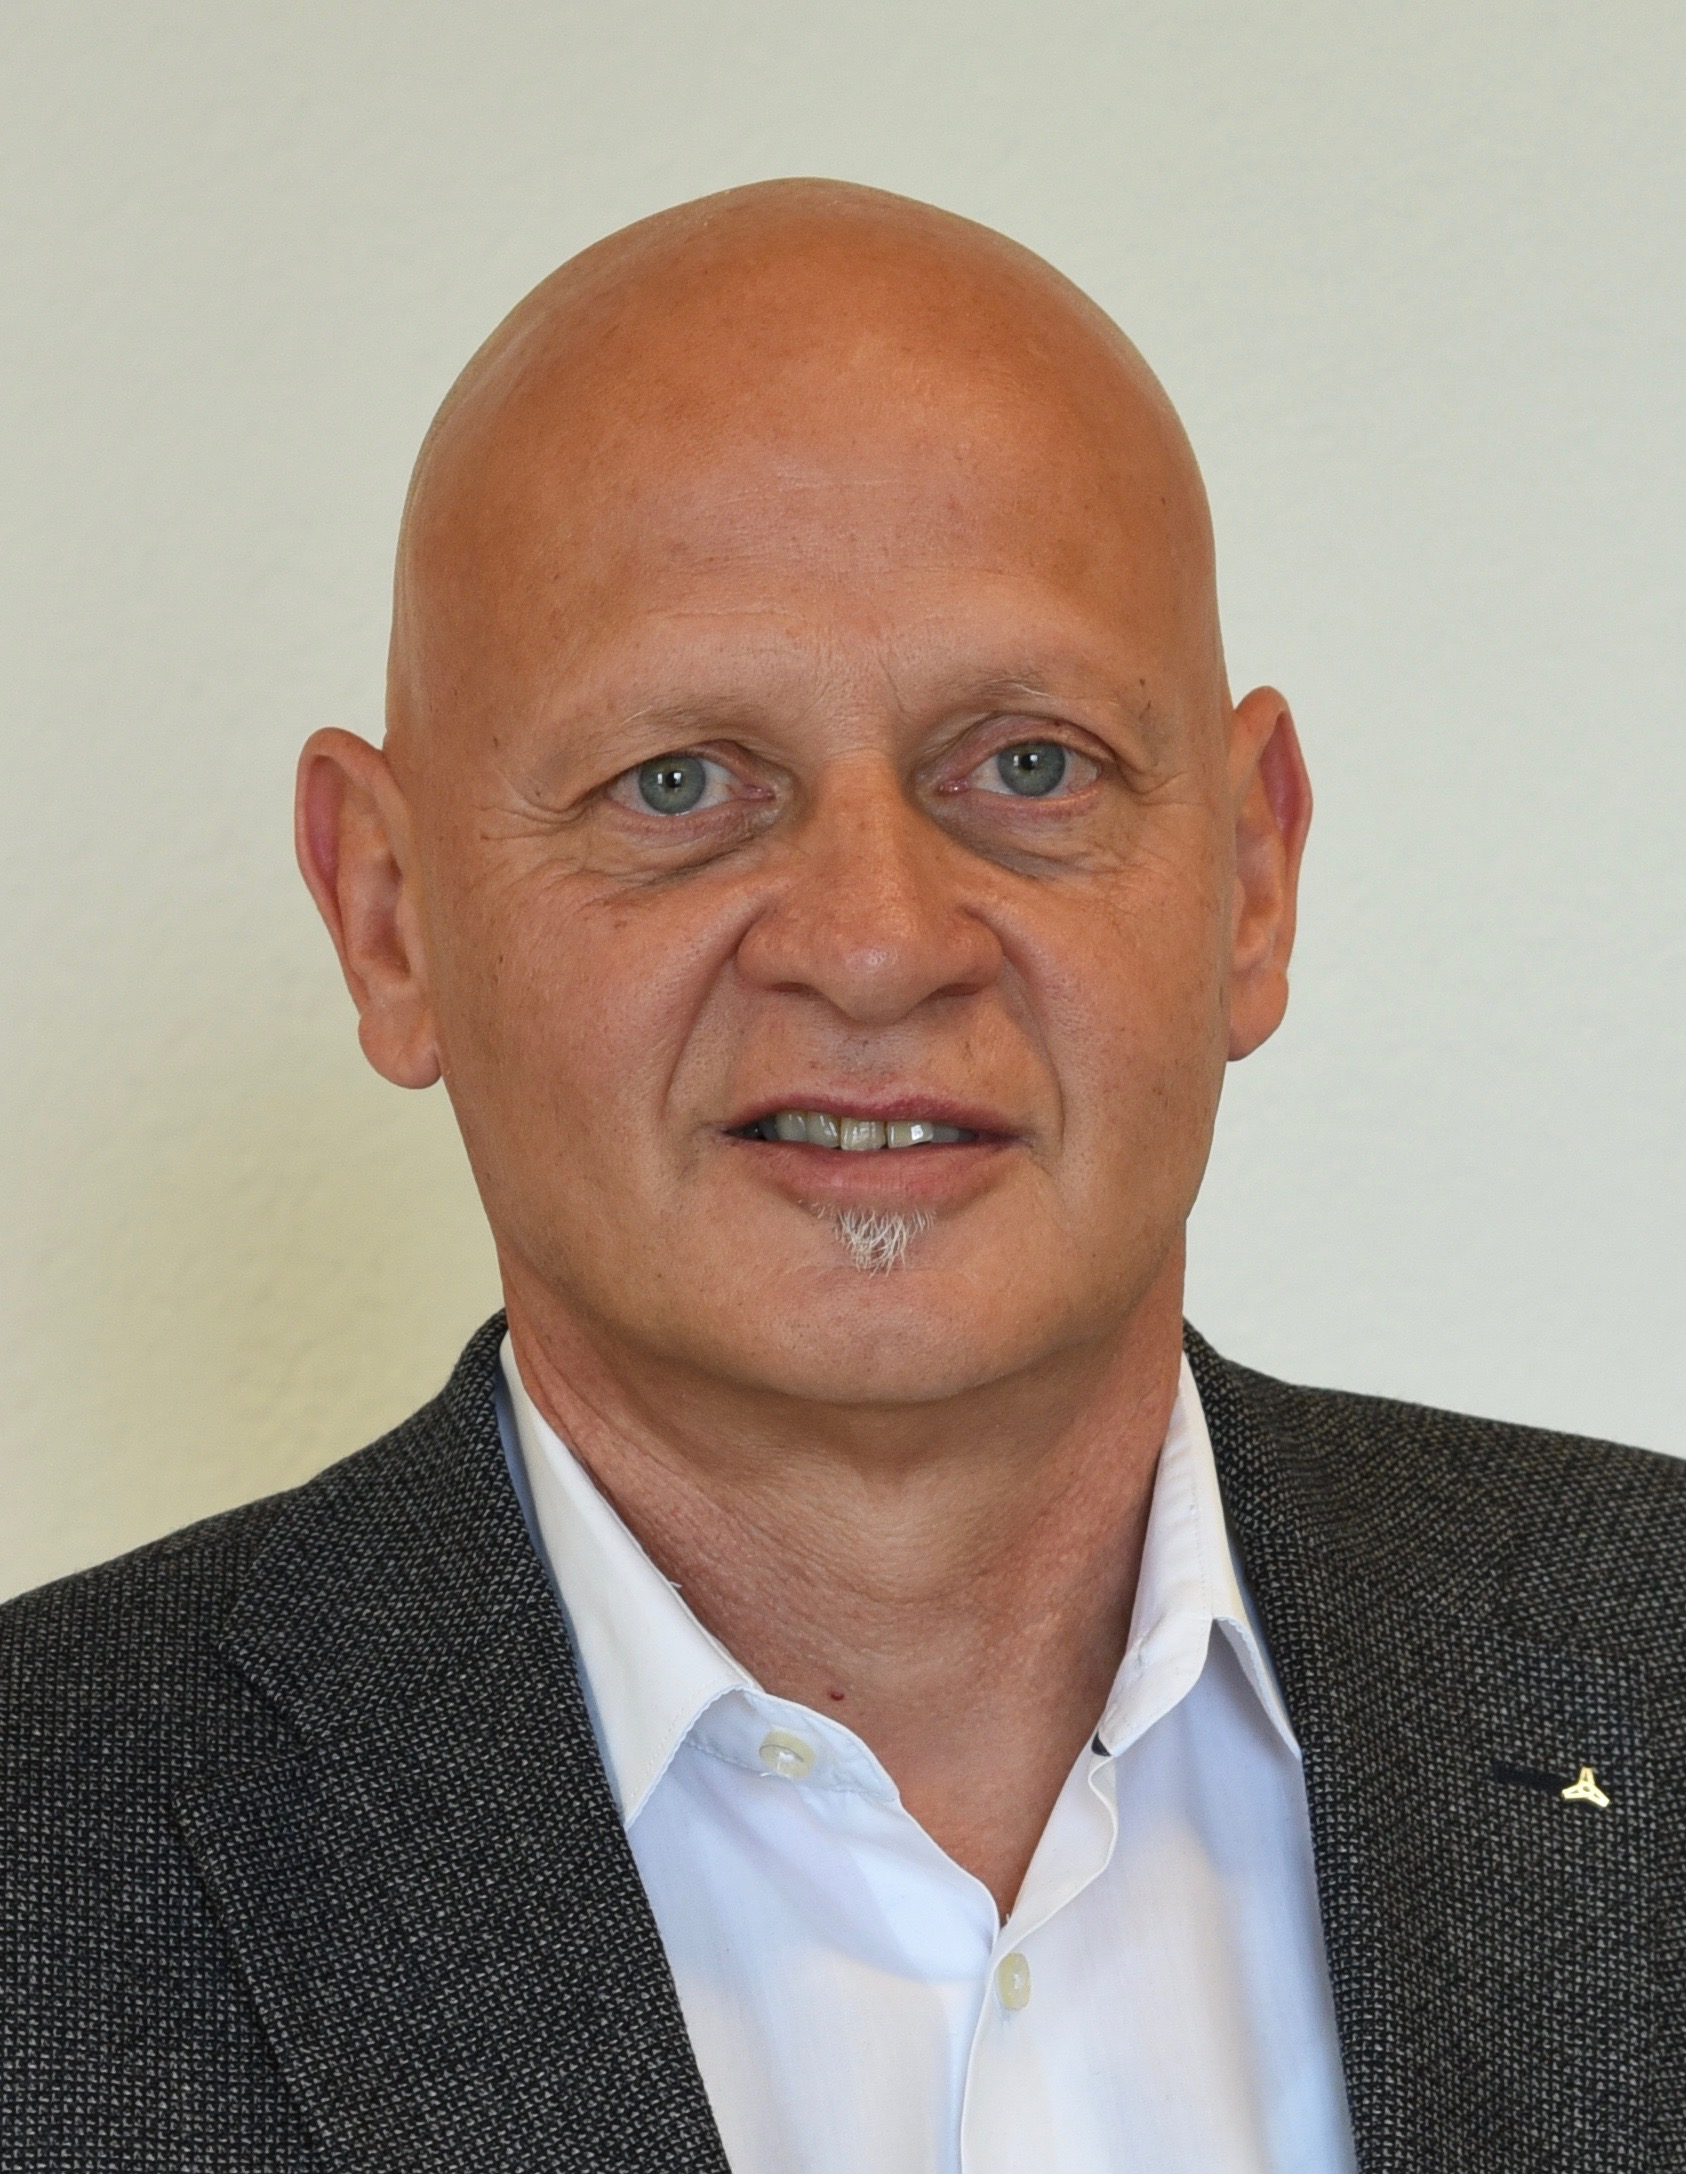 Hans Rawyler